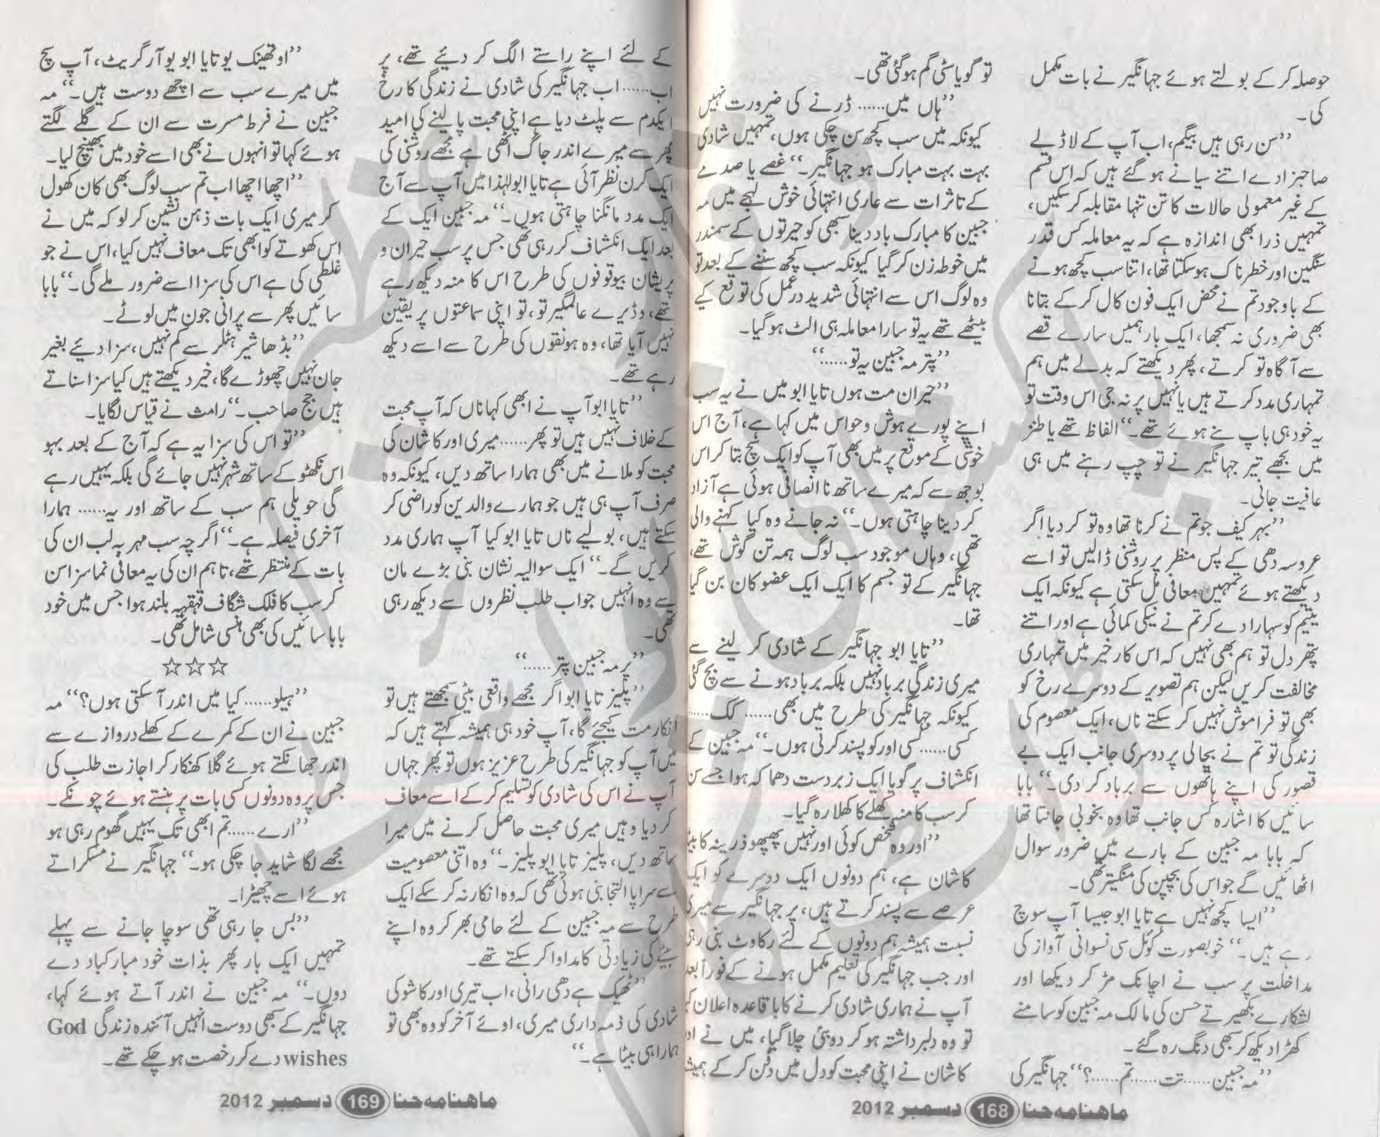 khel ki ahmiat in urdu By analyzing the massive data associated with the keyword kutub khane ki ahmiyat mazmoon in urdu khel ki ahmiyat essay in urdu 10+ 0 001.